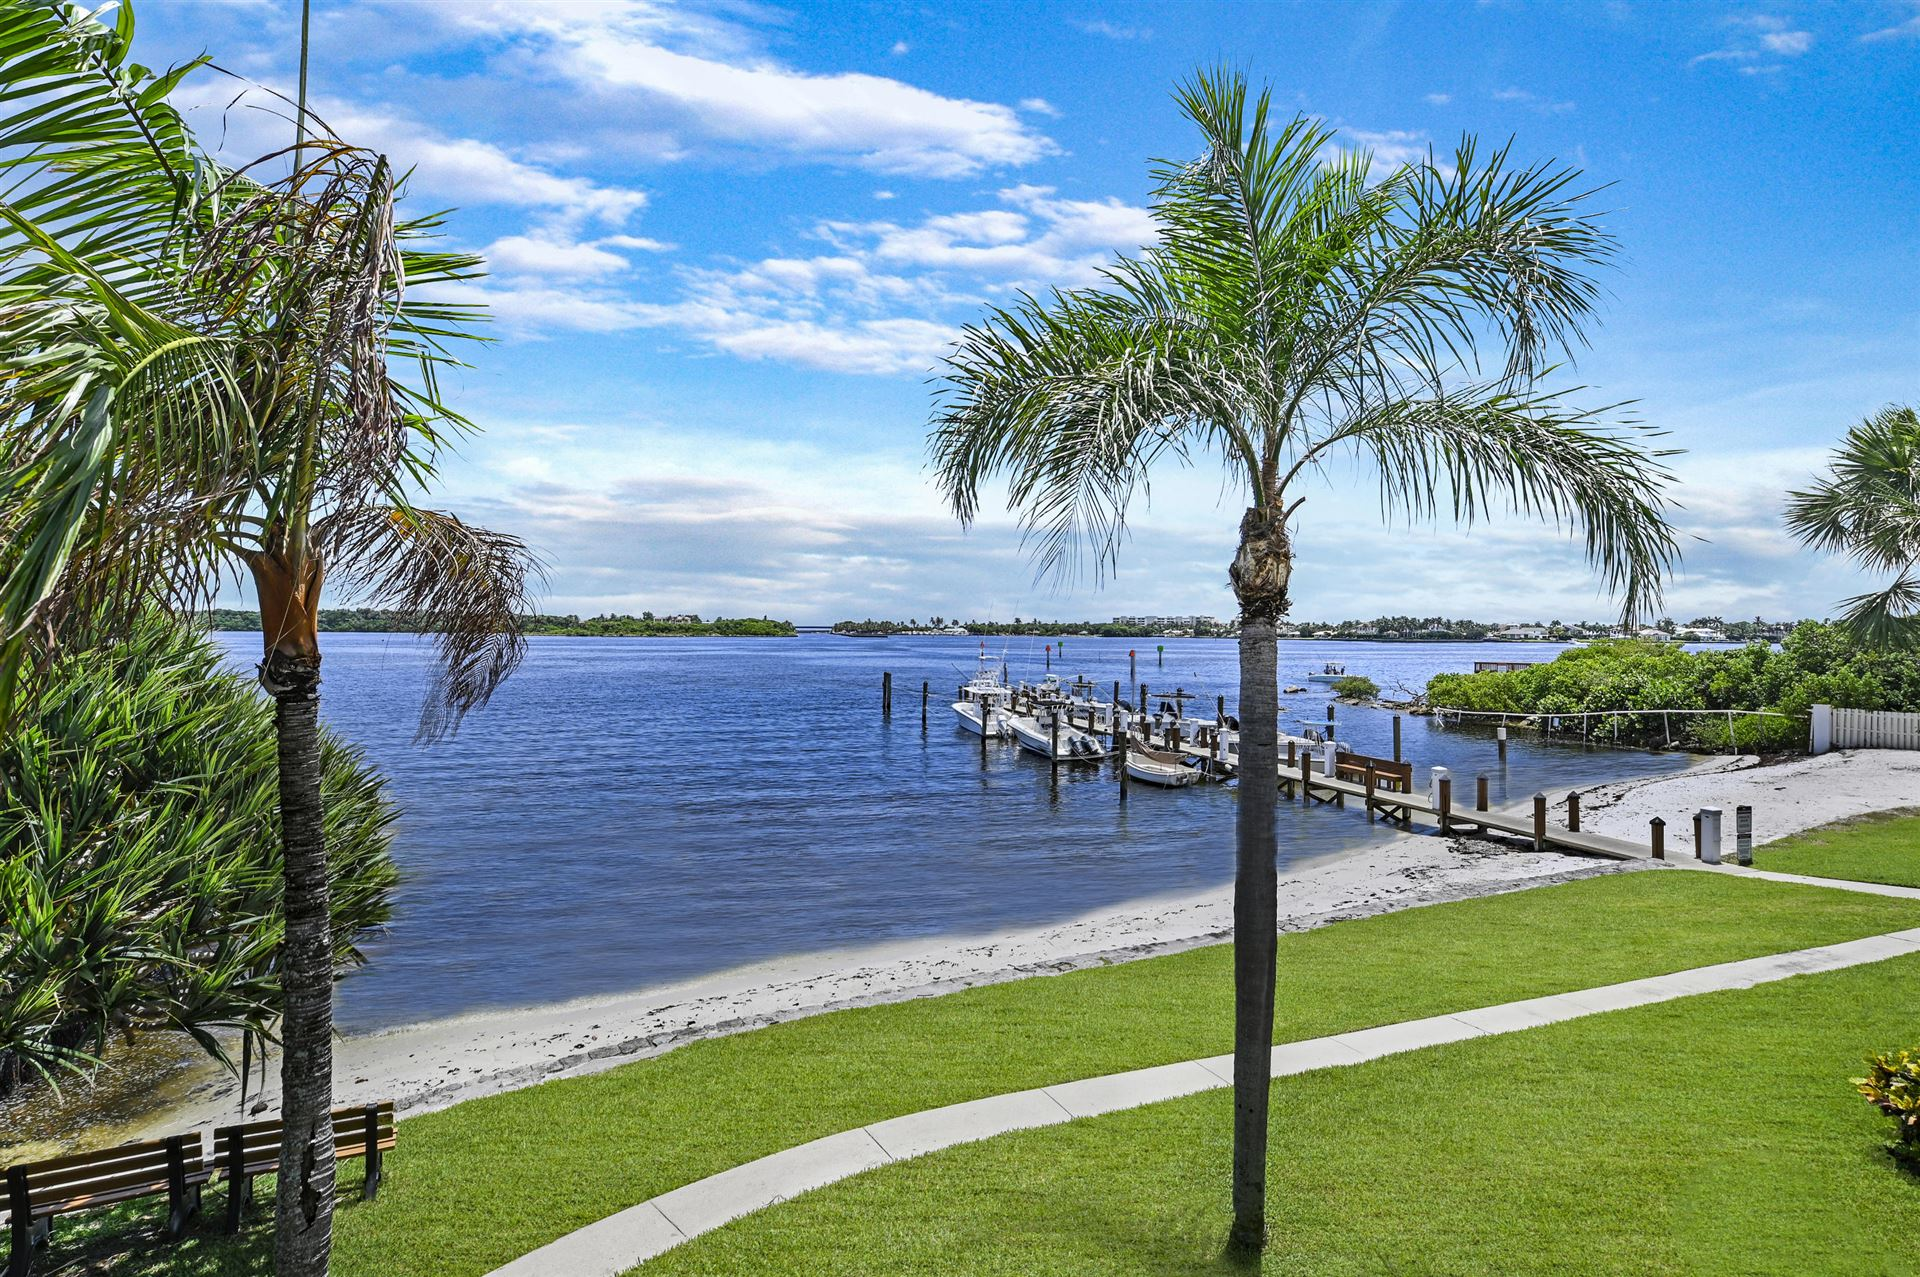 Photo of 742 NE 20th Lane, Boynton Beach, FL 33435 (MLS # RX-10645252)